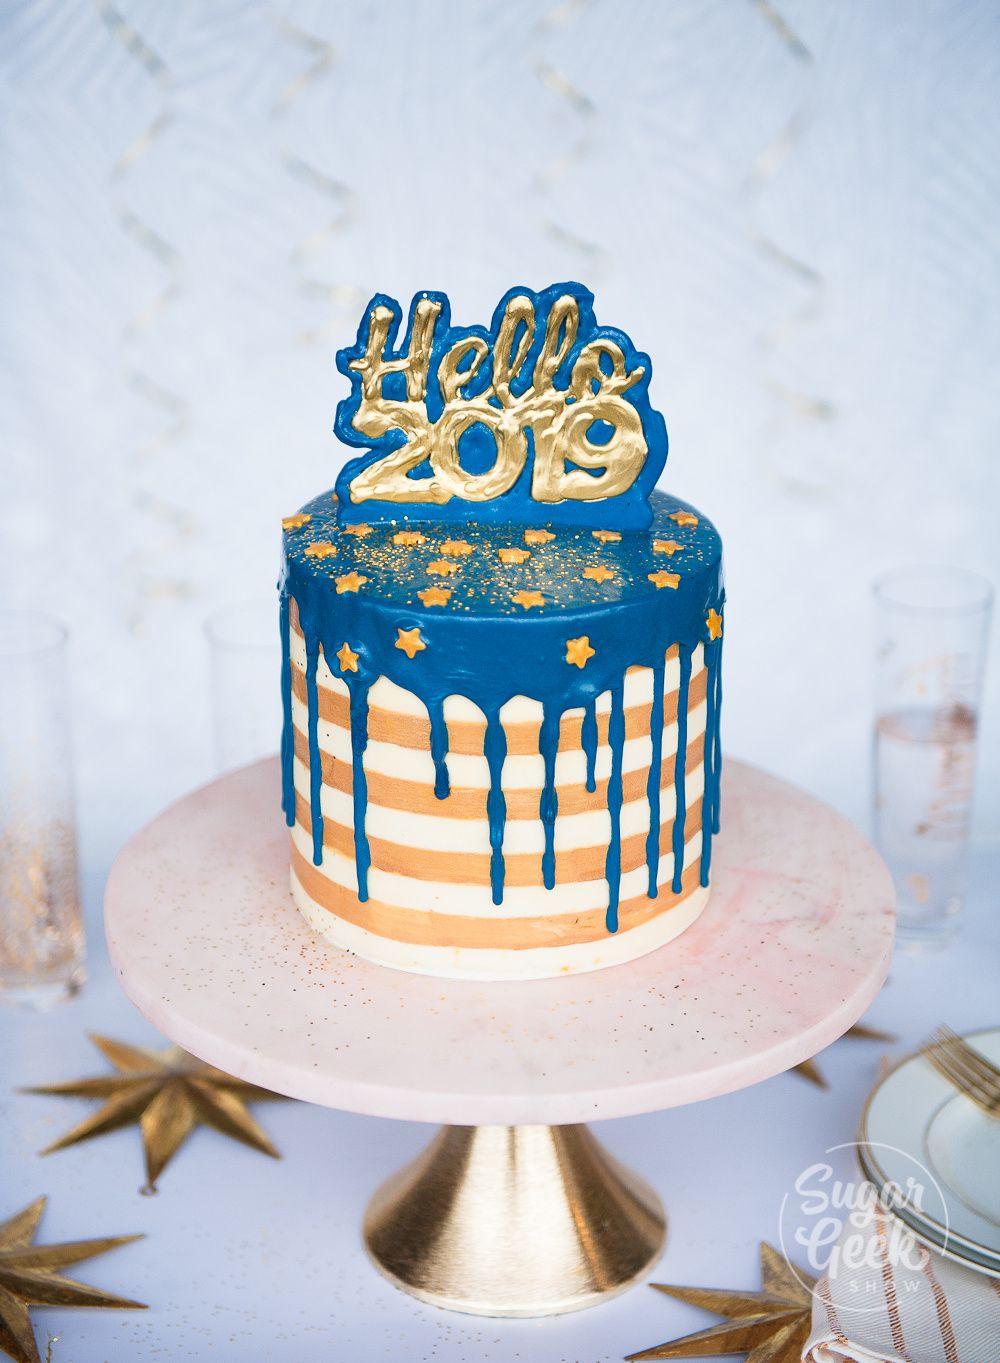 New Years Eve Cake Recipe Cake, Tasty chocolate cake